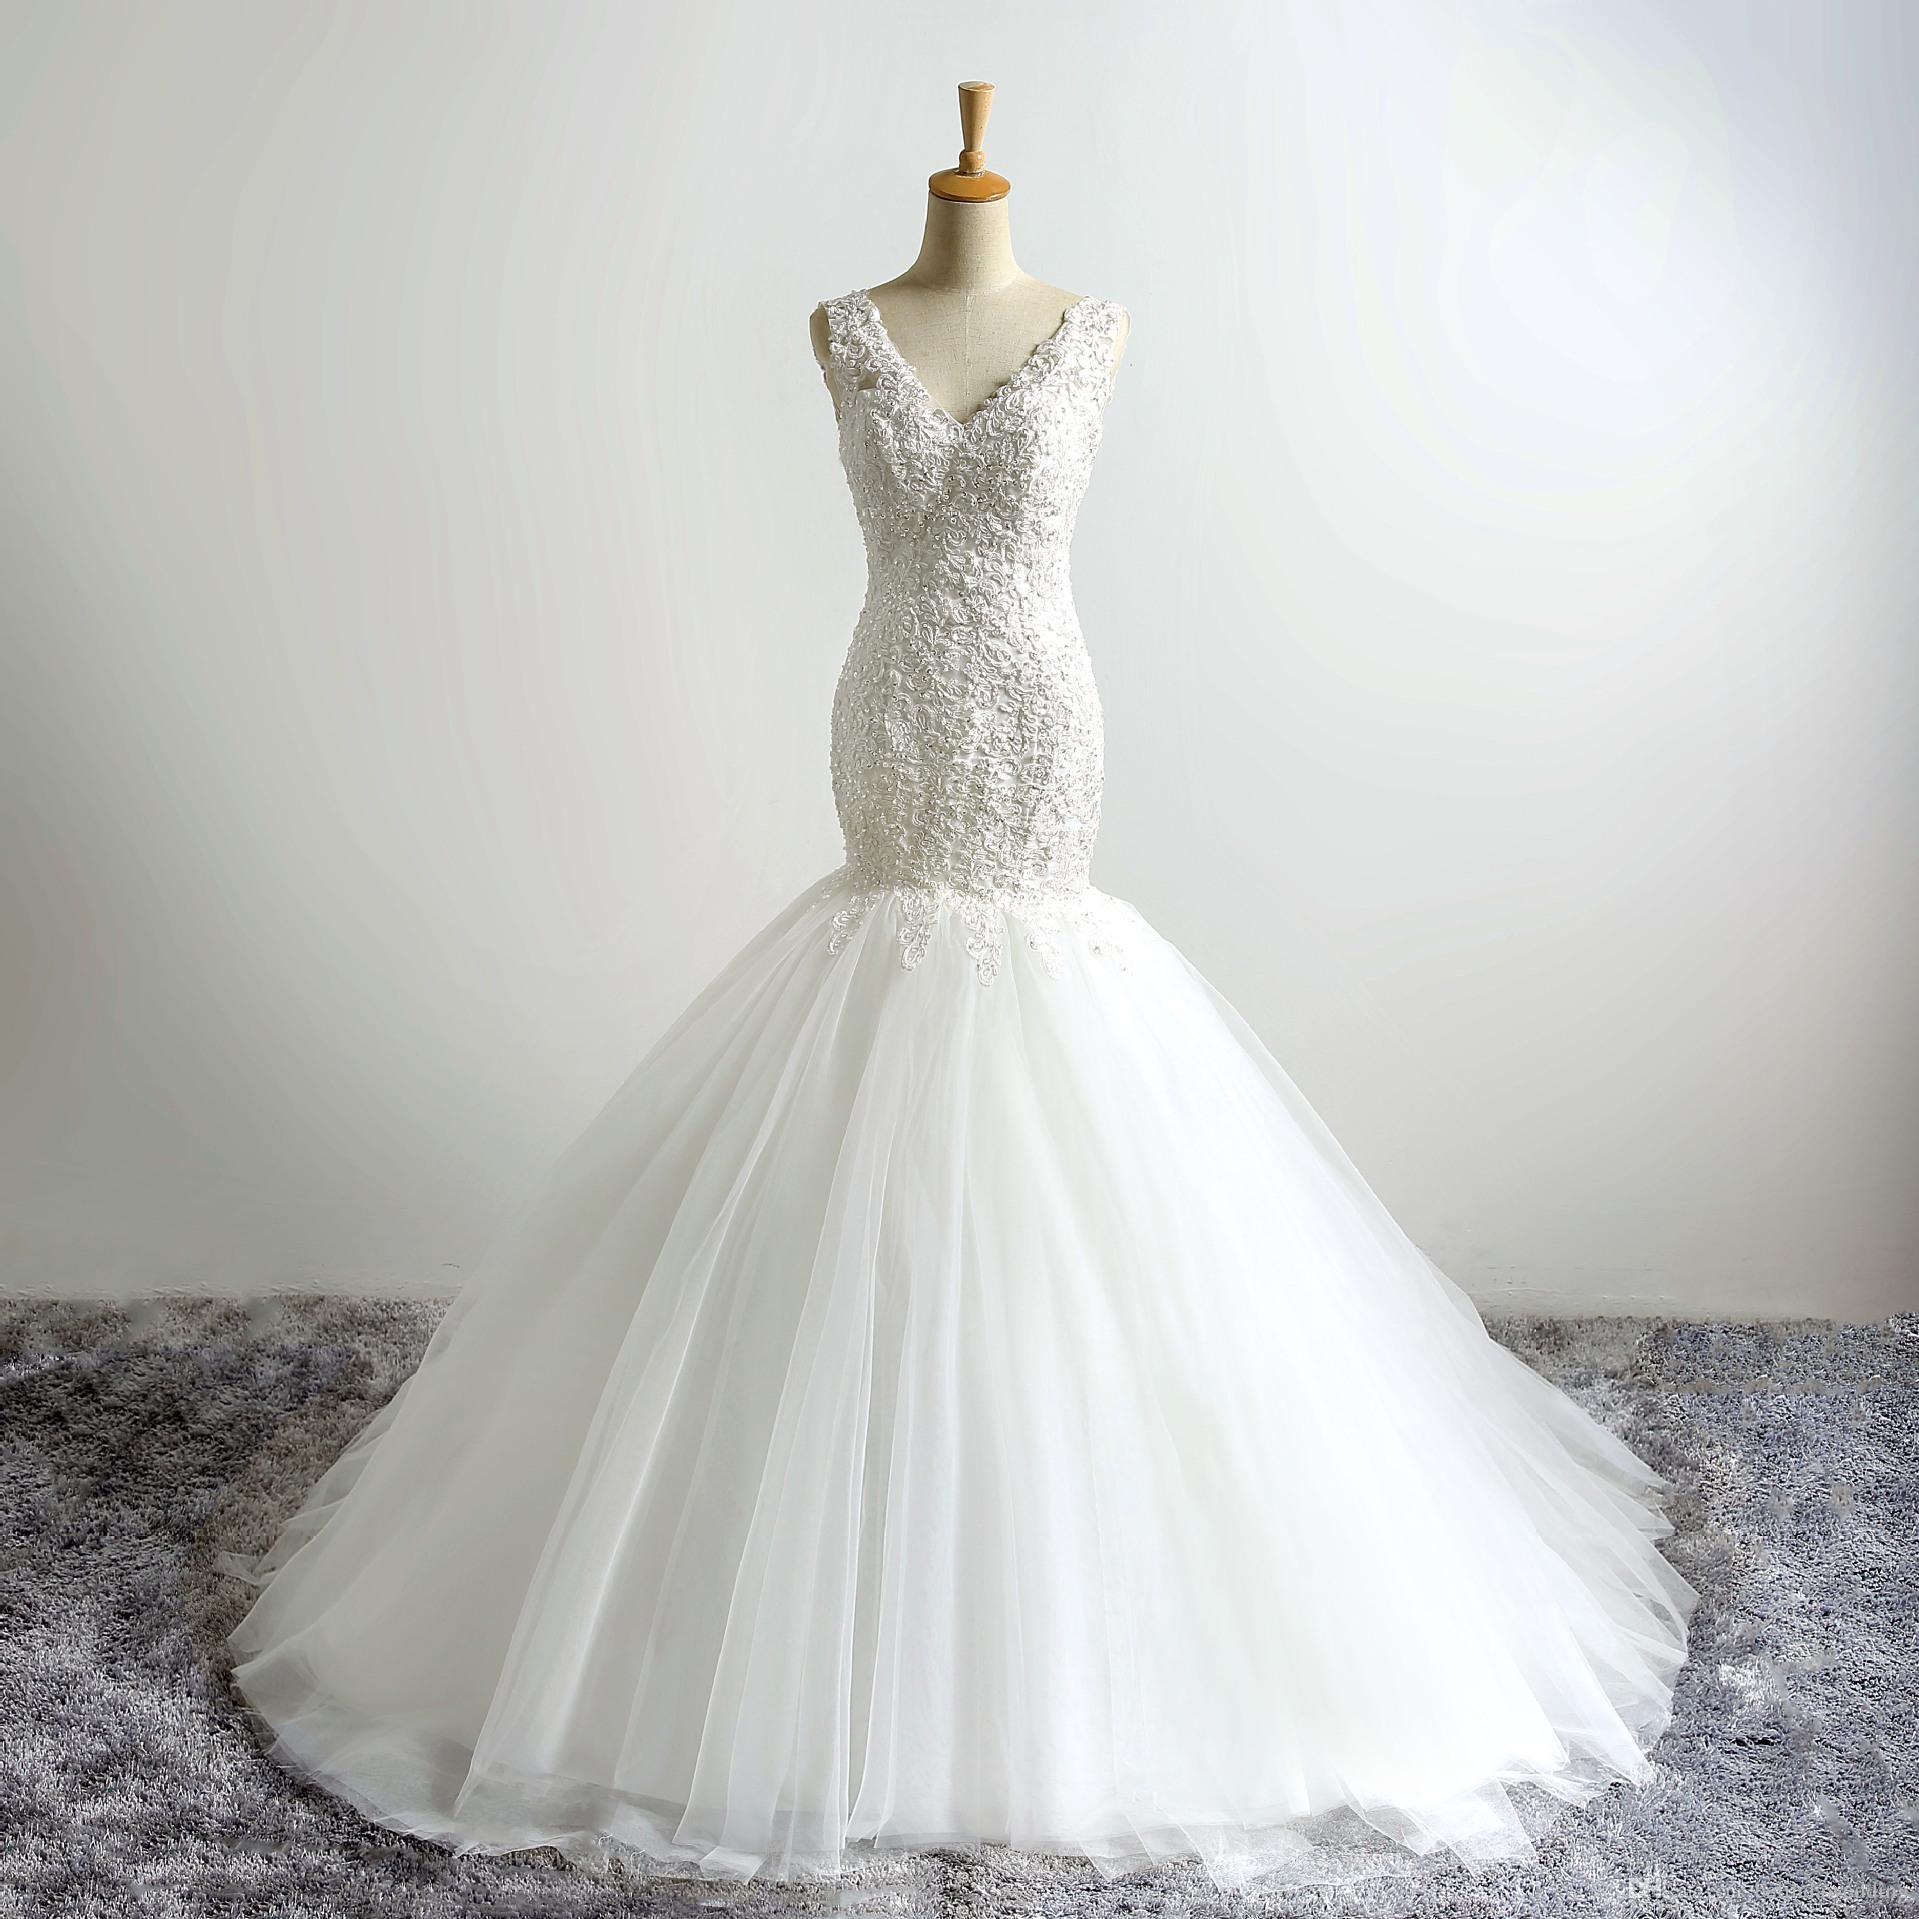 Crystal Beaded Mermaid Wedding Dresses Bridal Gowns 2016